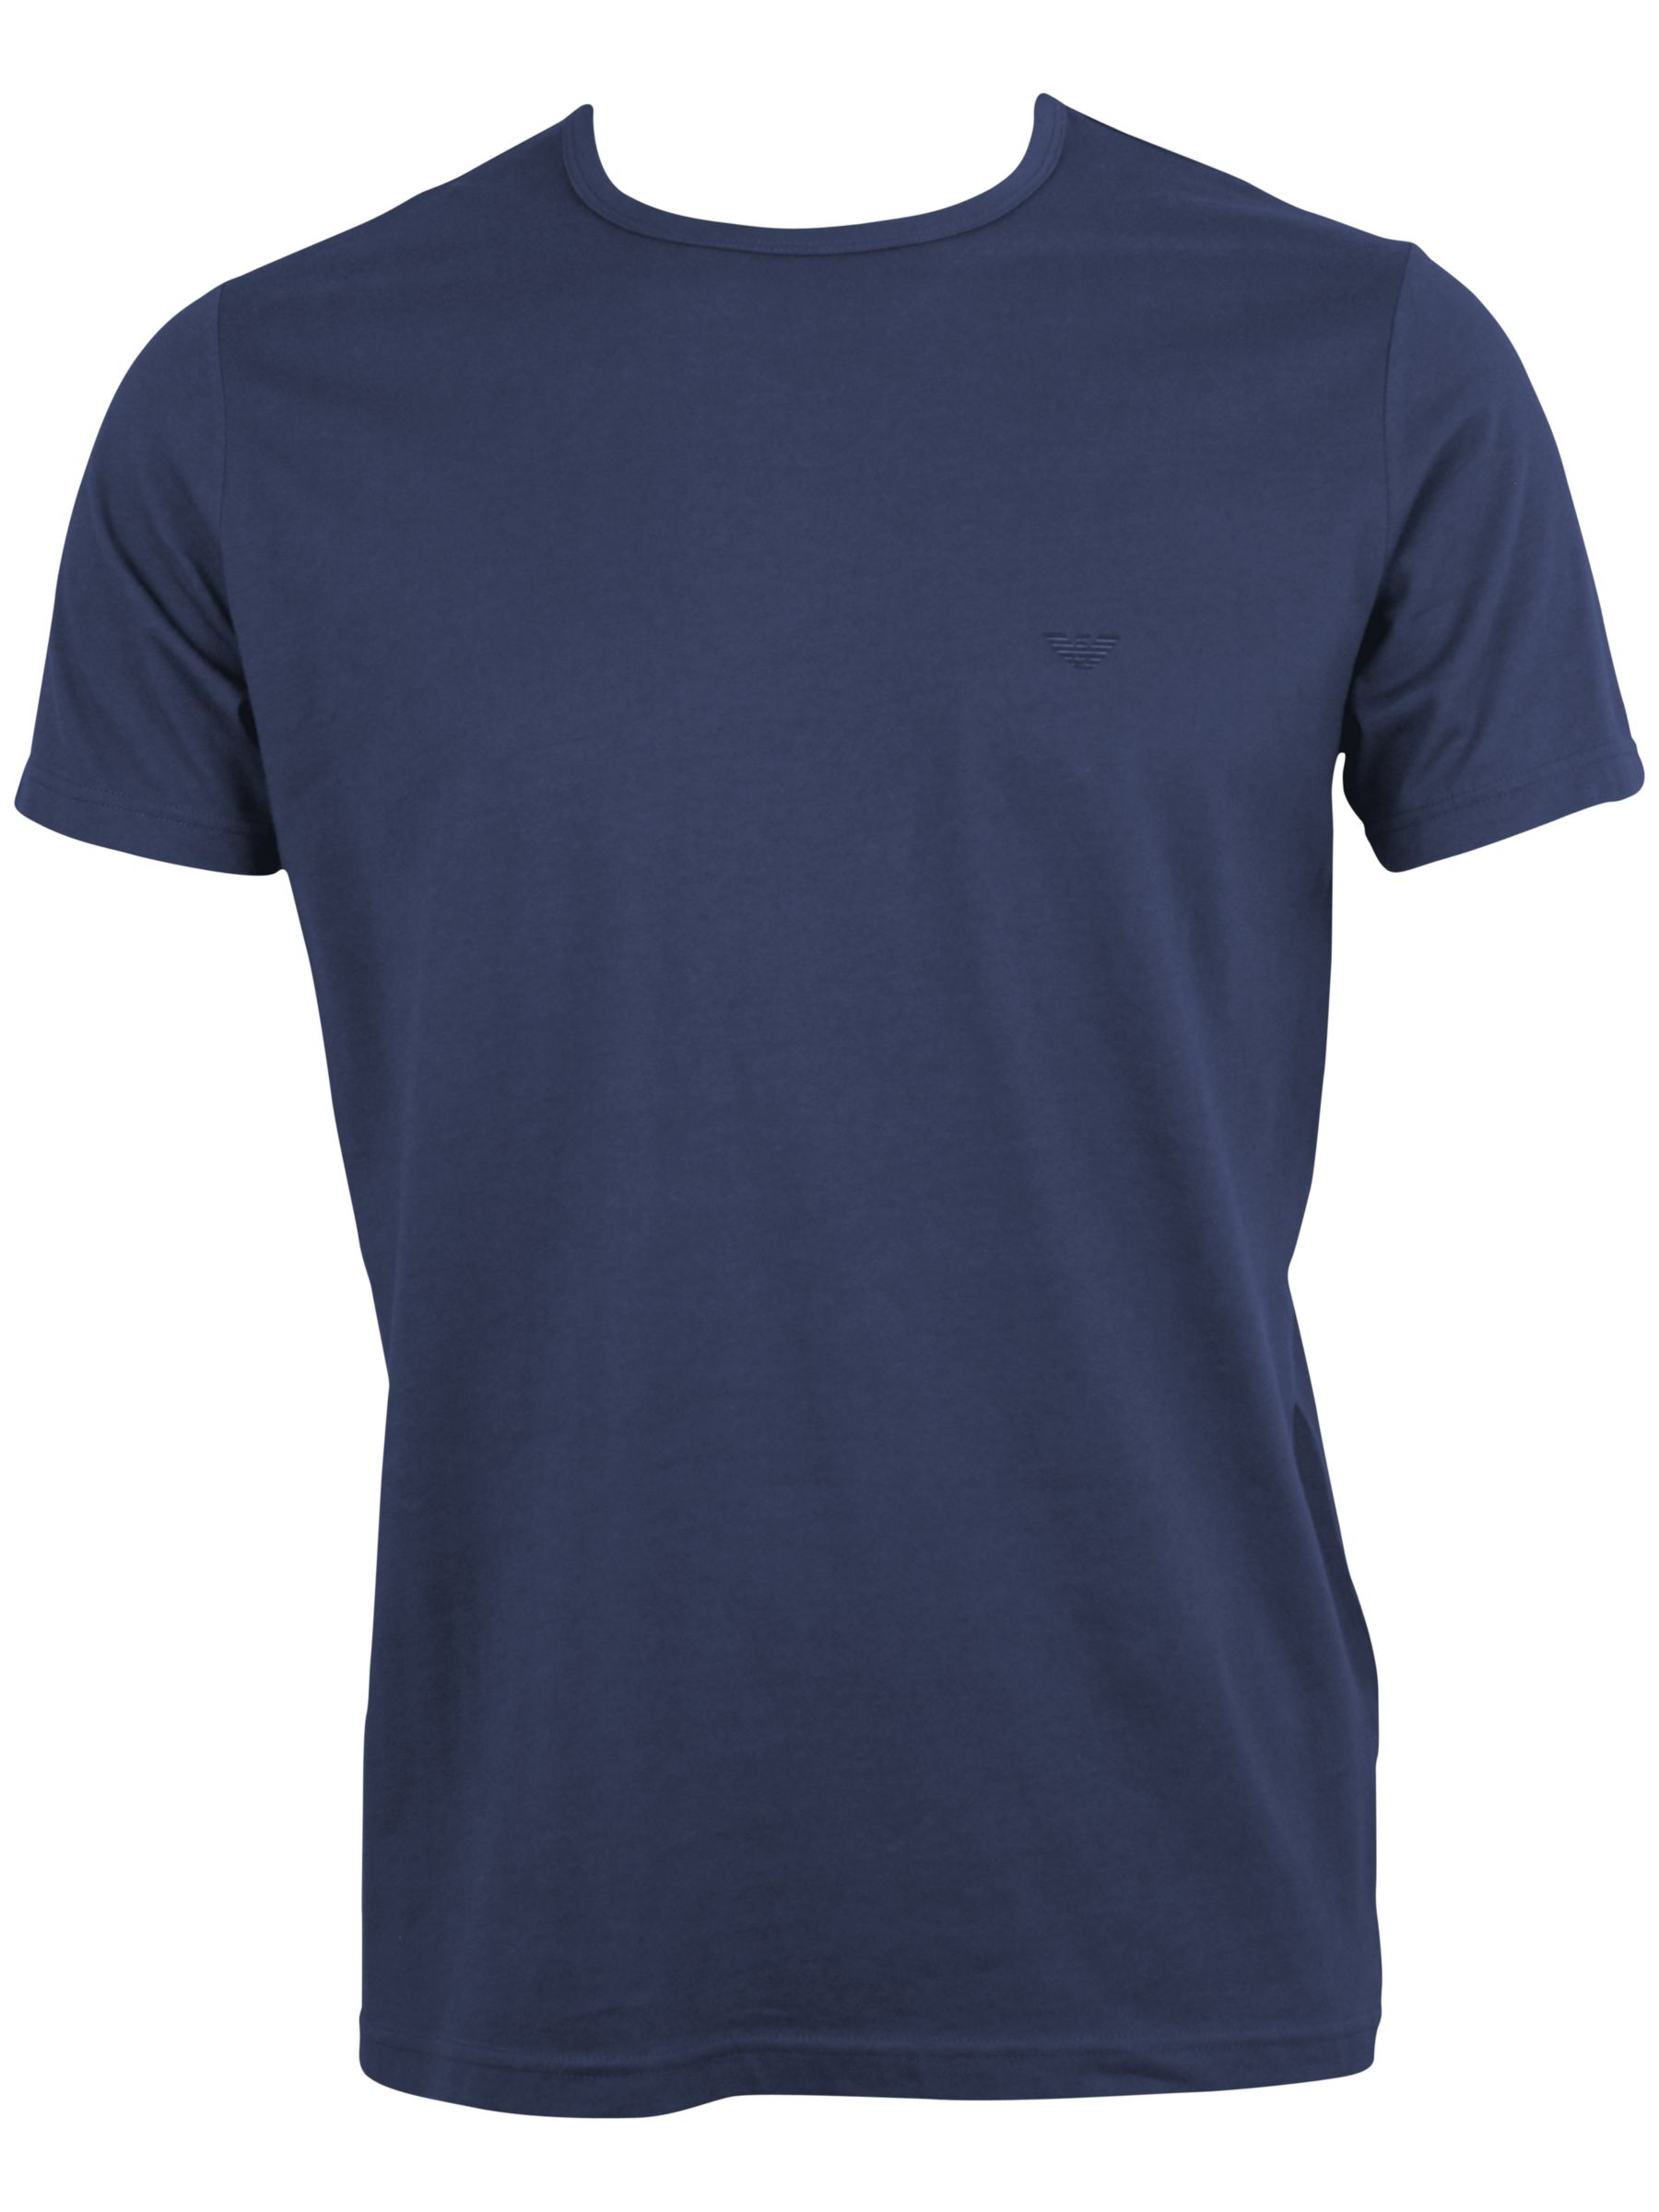 Emporio Armani Jersey Crew Neck T-Shirt, Blue